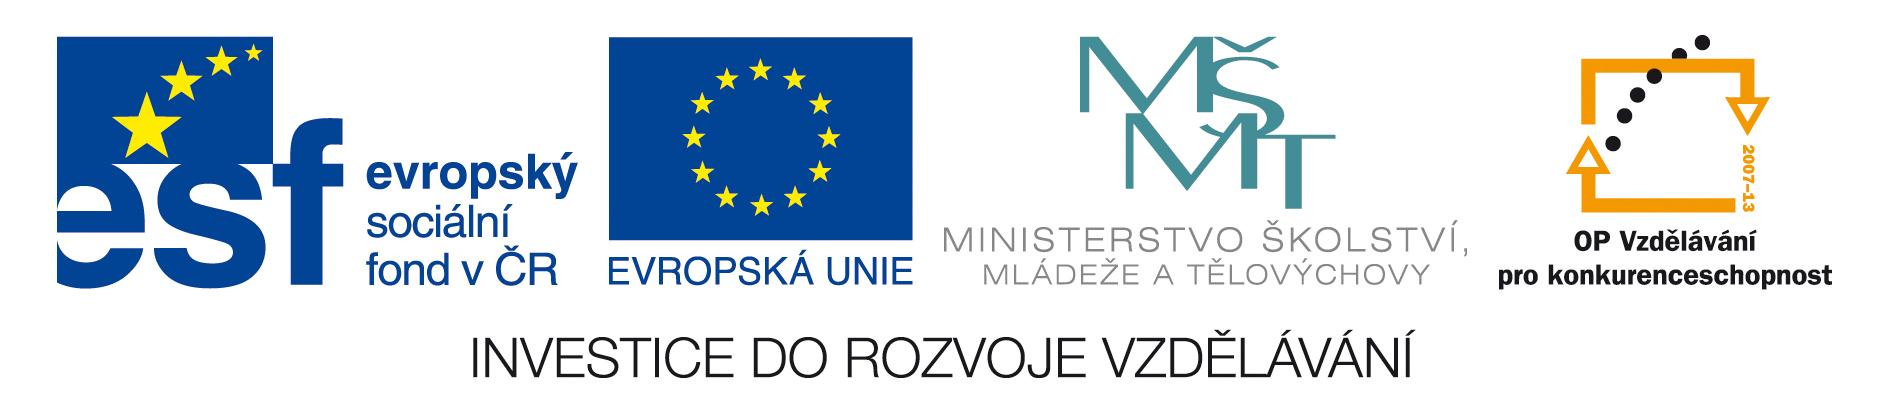 Evropsky_socialni_fond_statni_rozpočet_cr_logo